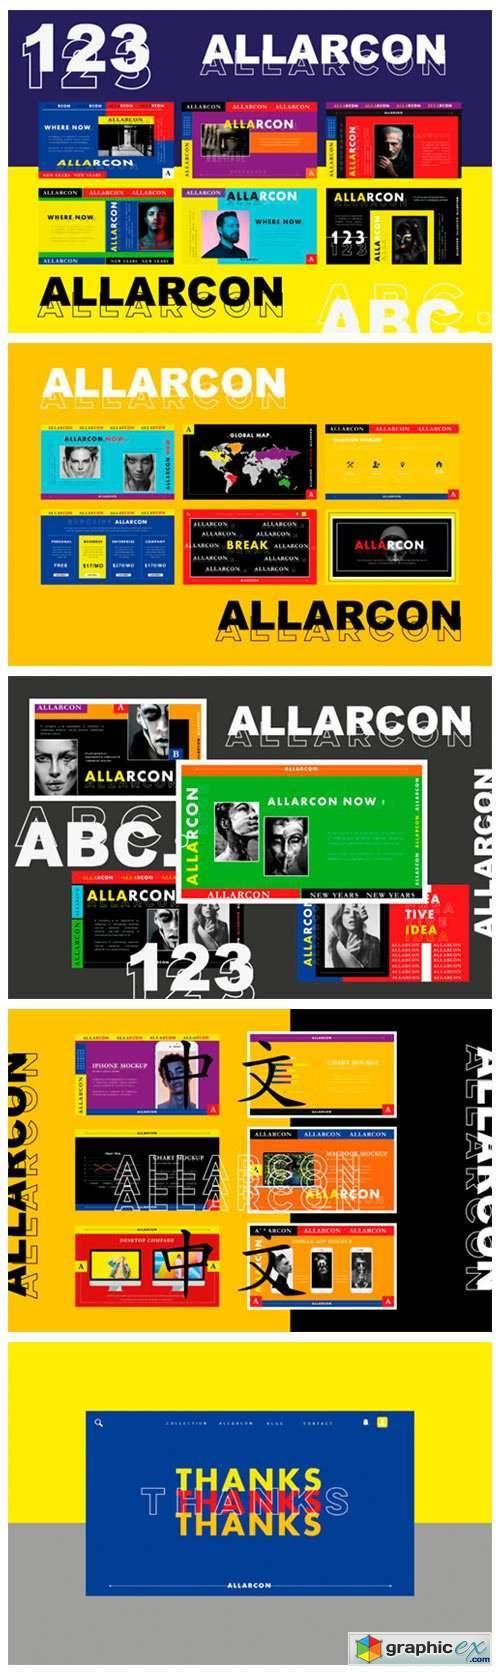 Allarcon - Google Slides Template